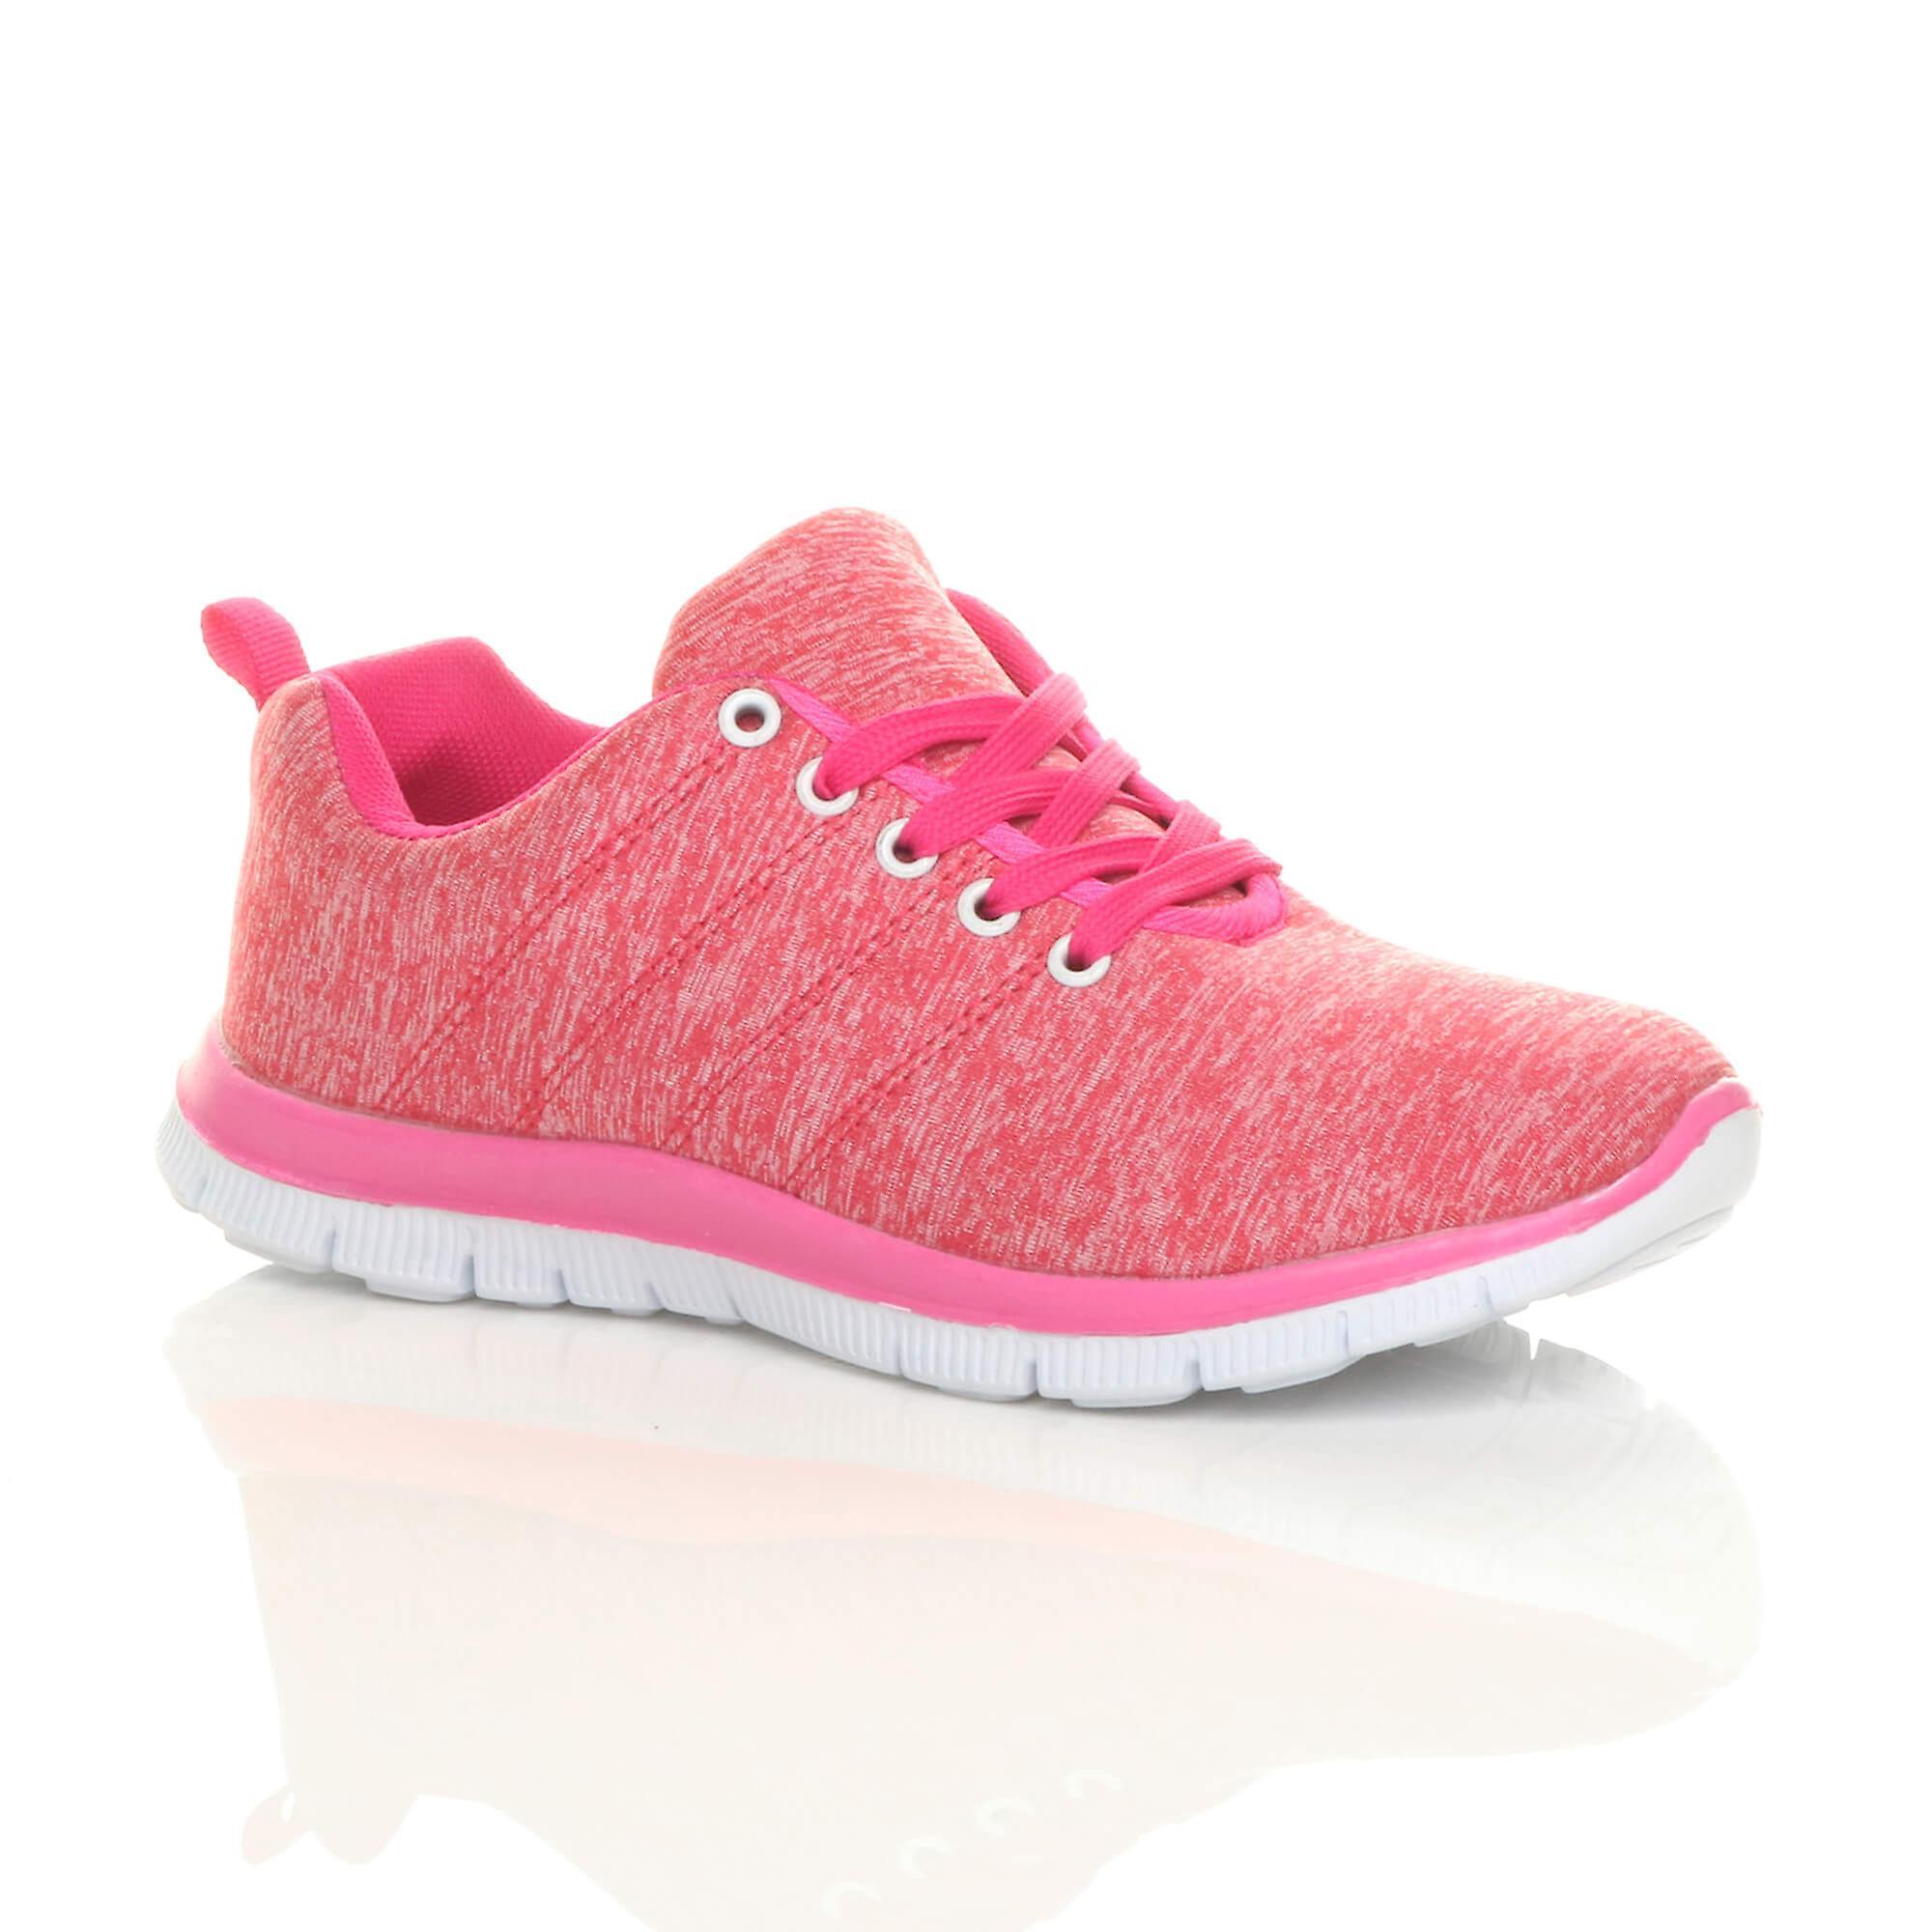 Ajvani womens lace up comfort gym trainers sneakers sport plimsolls DGz4c